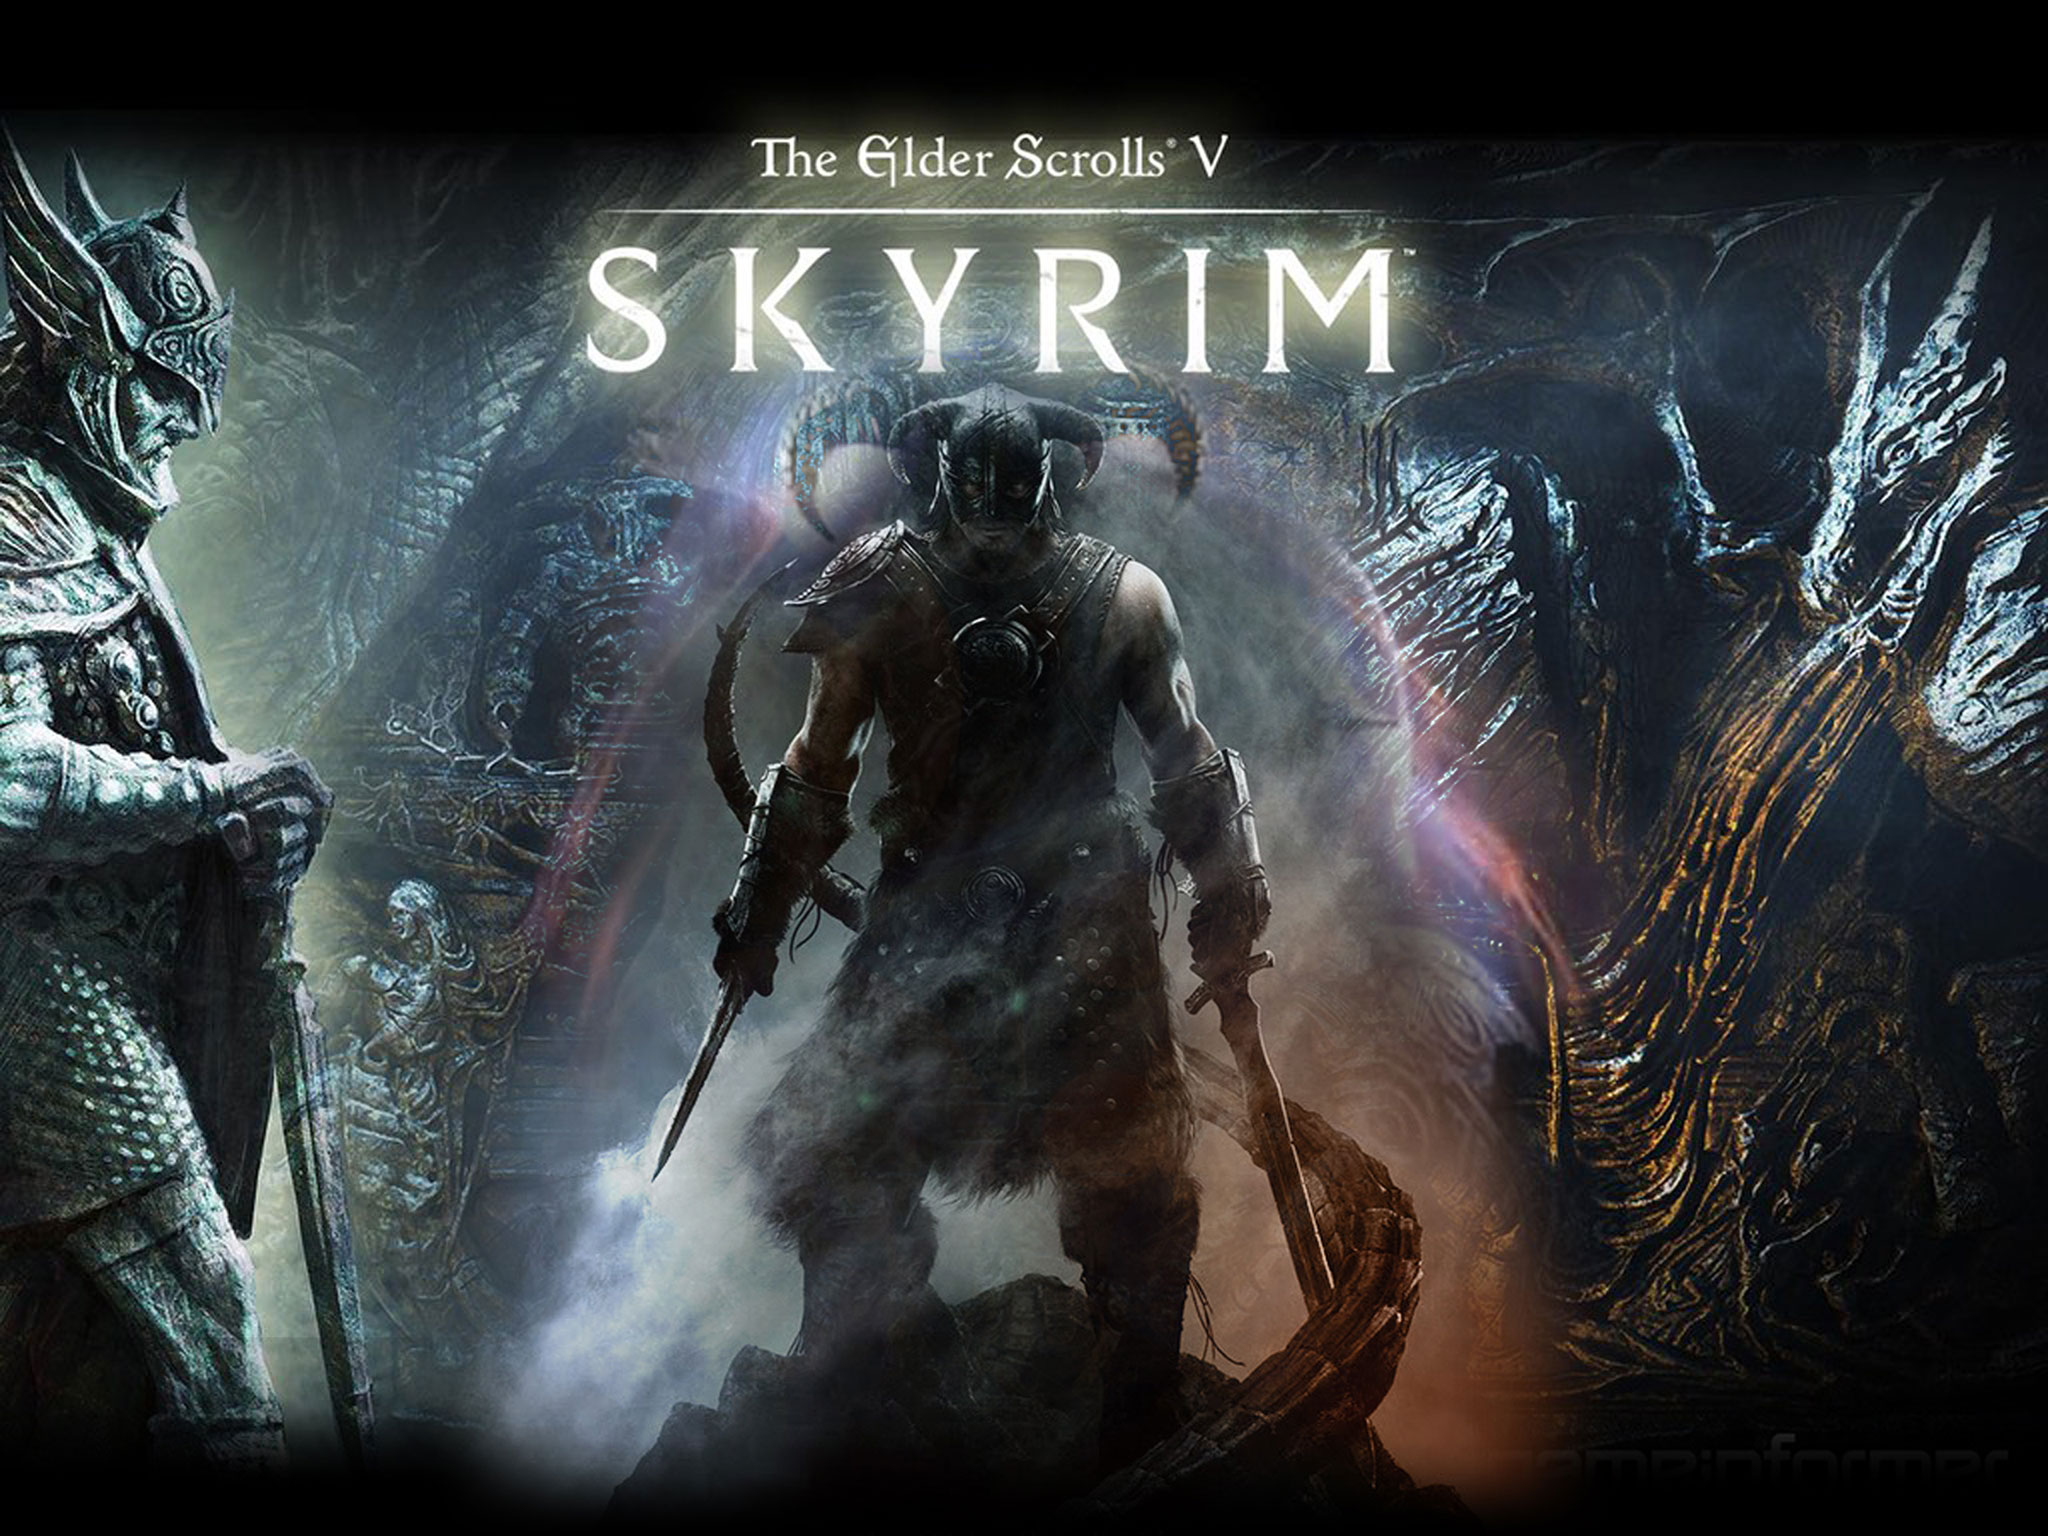 Games Wallpapers   The Elder Scrolls V Skyrim 2048x1536 wallpaper 2048x1536